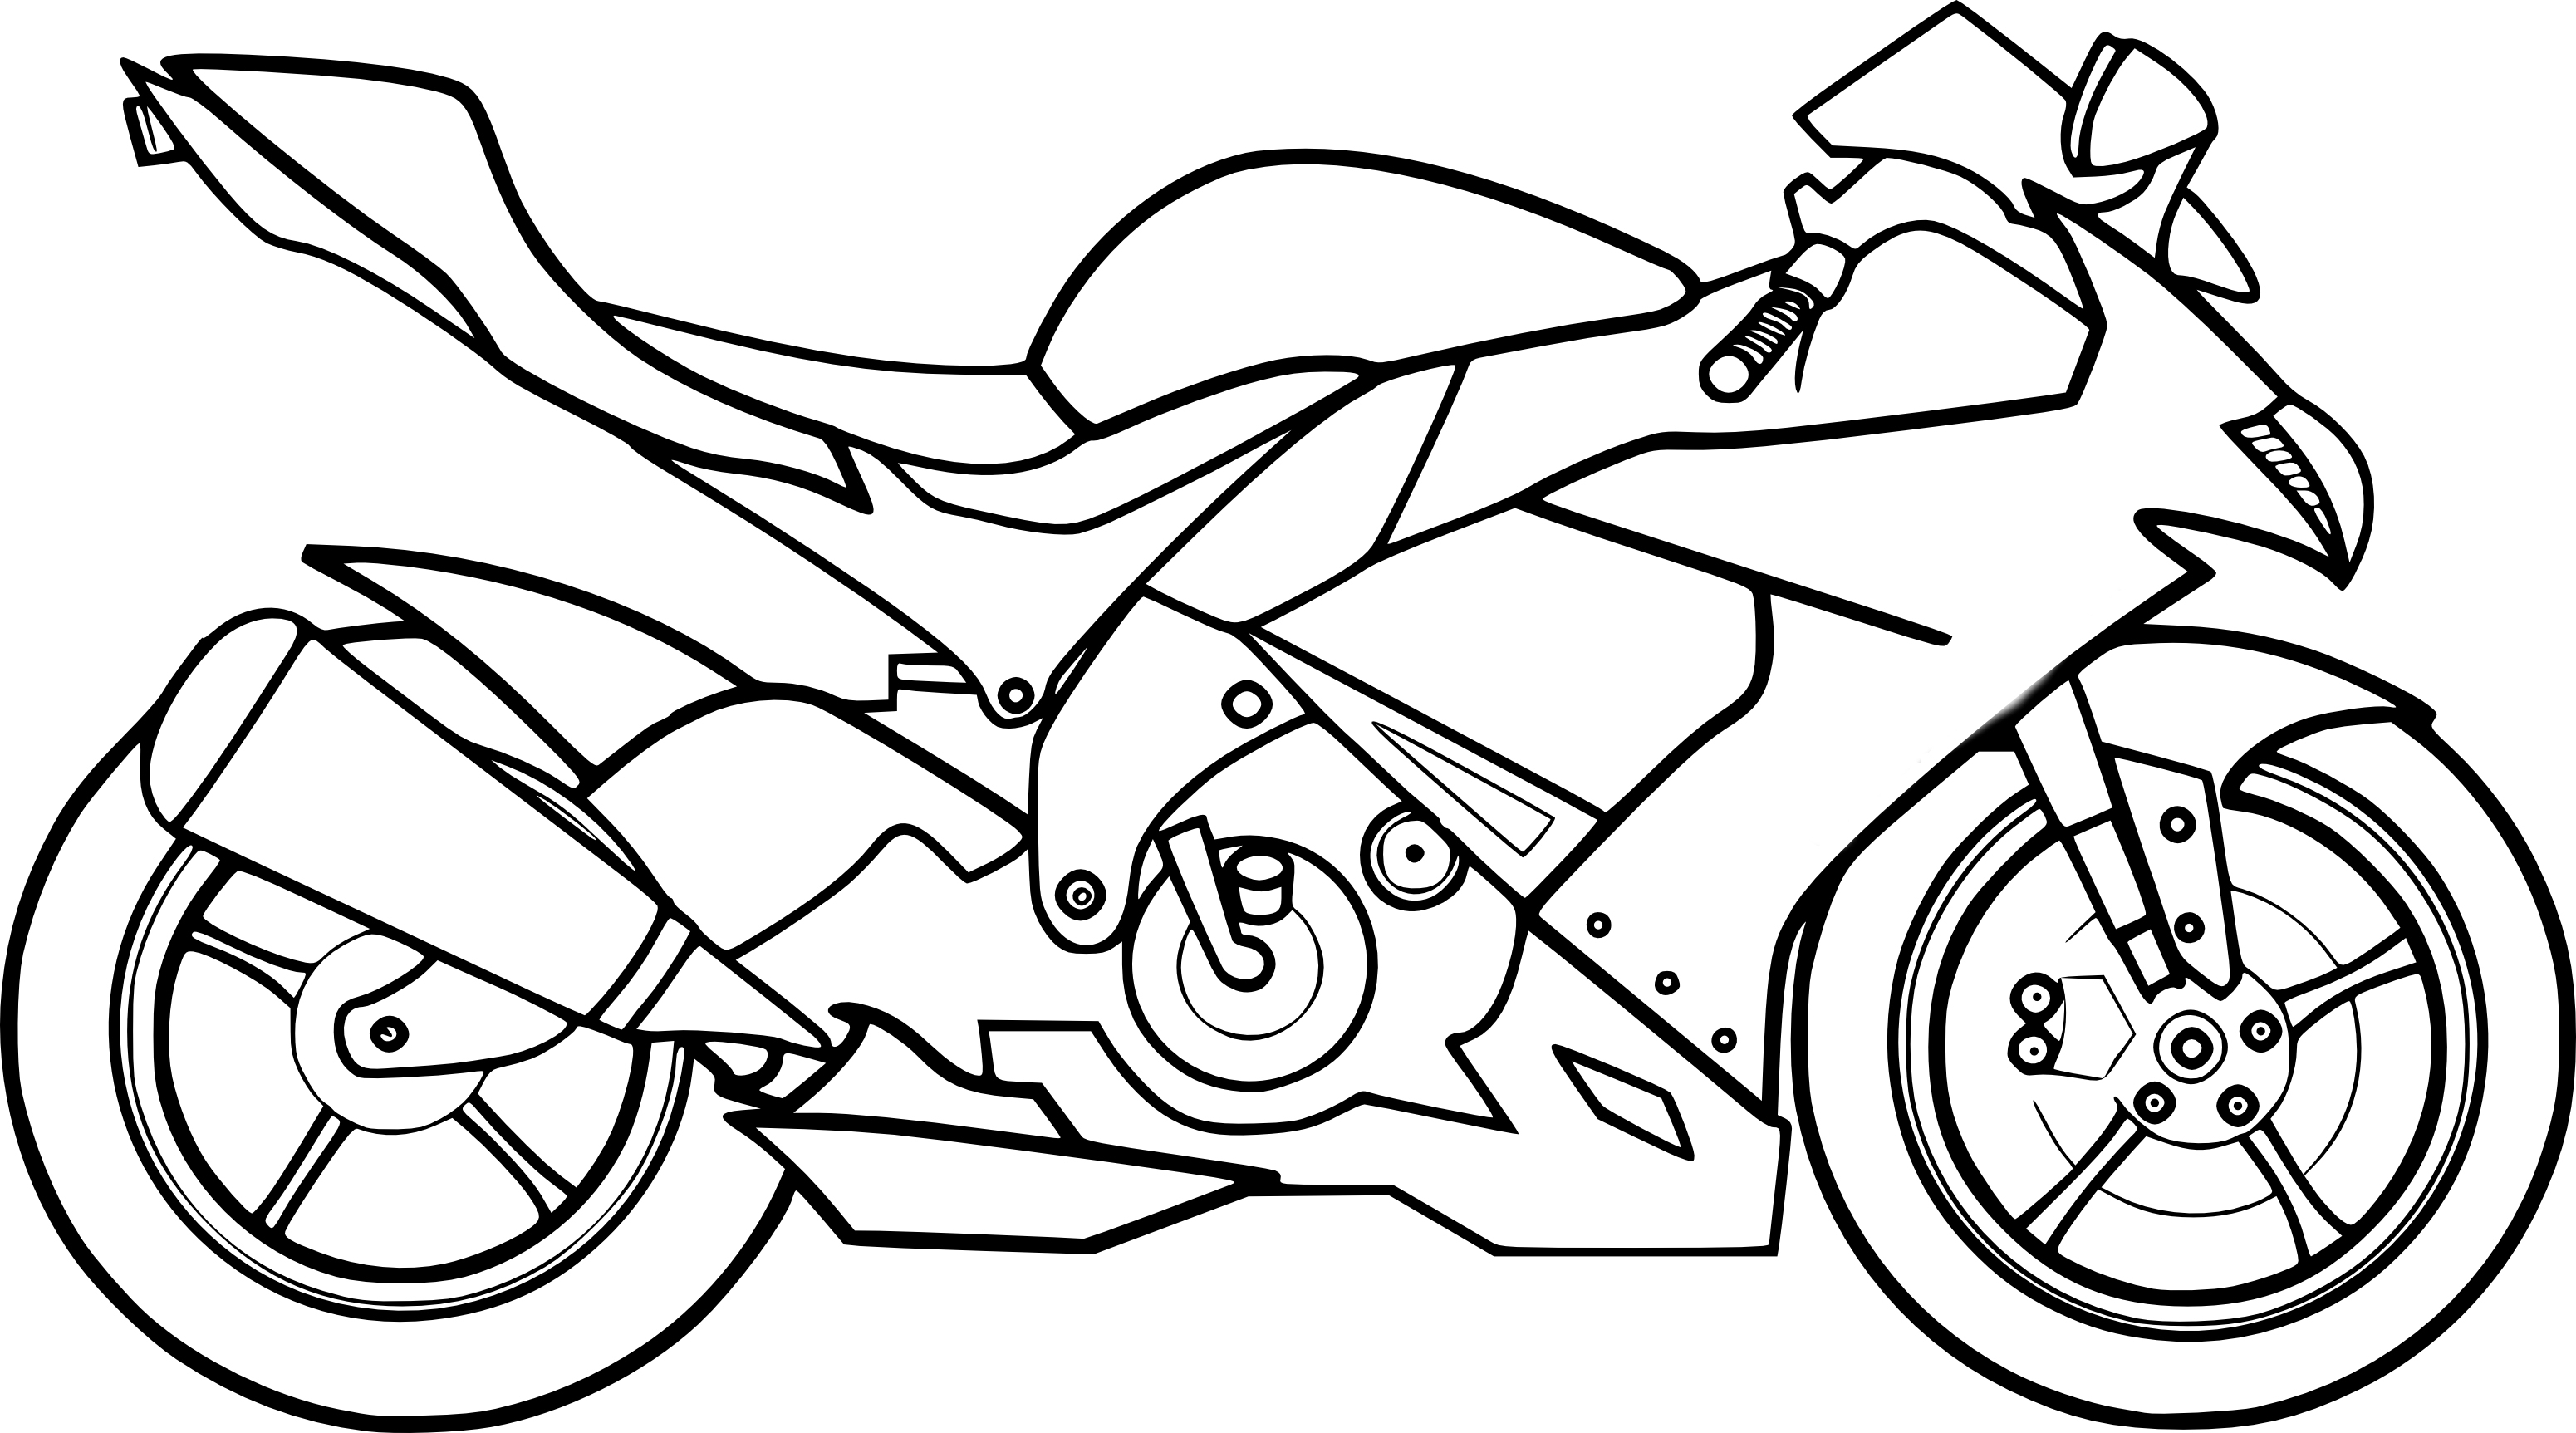 Dessus Coloriage Moto A Imprimer | Haut Coloriage Hd destiné Coloriage Moto Cross À Imprimer